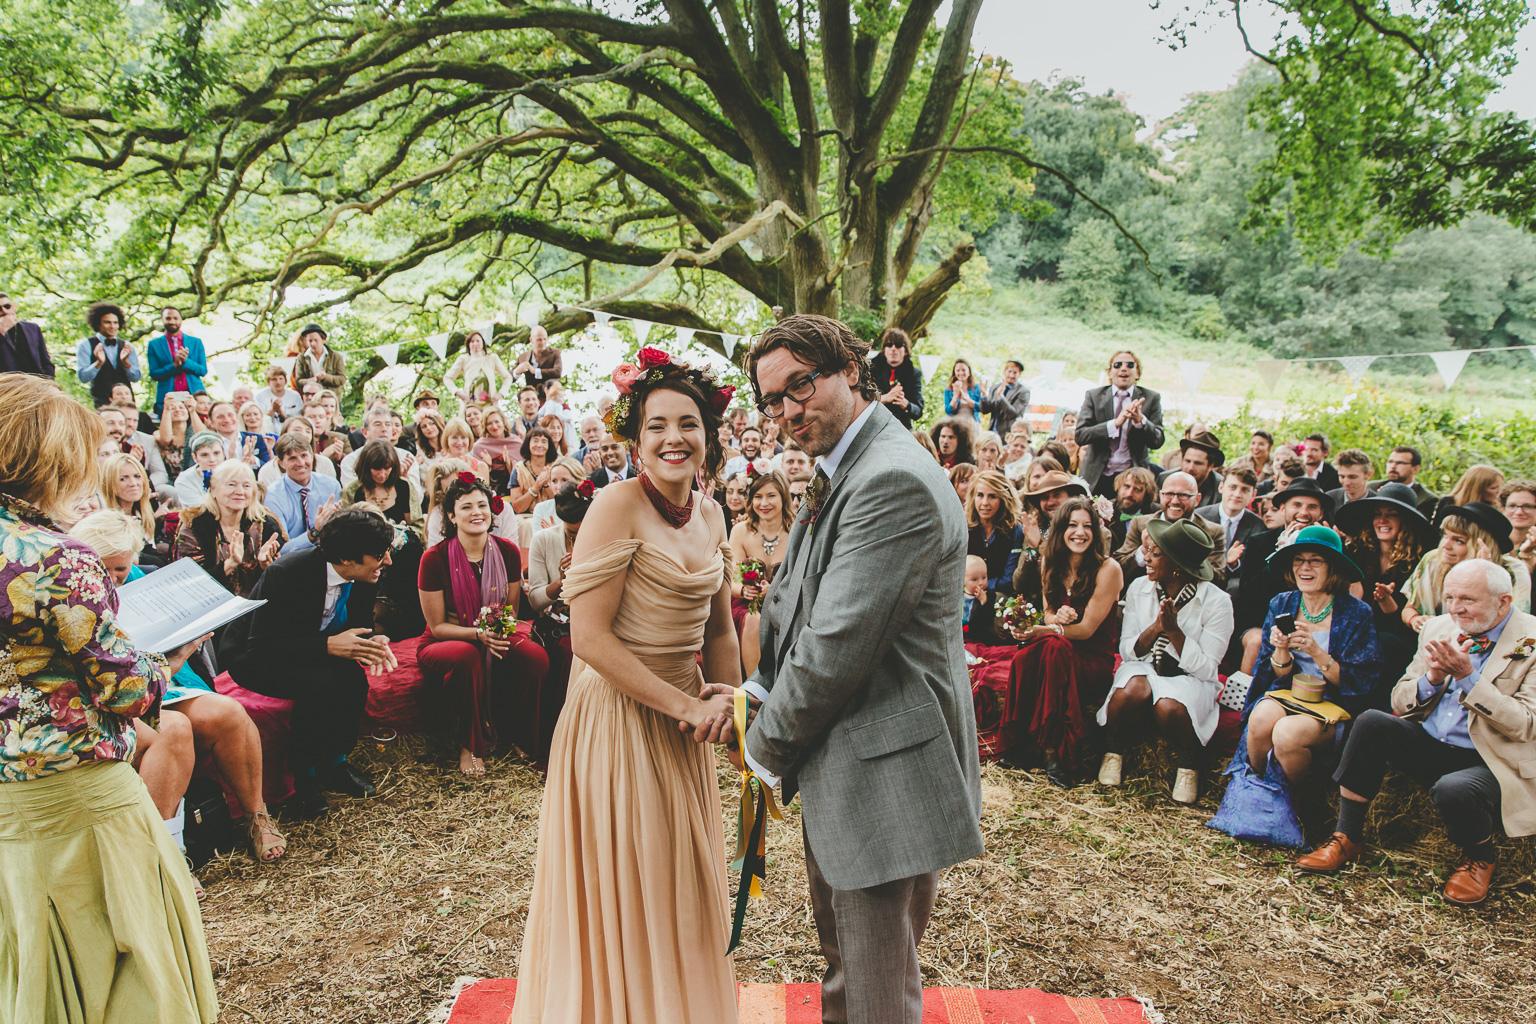 Festival-wedding-photography-00007